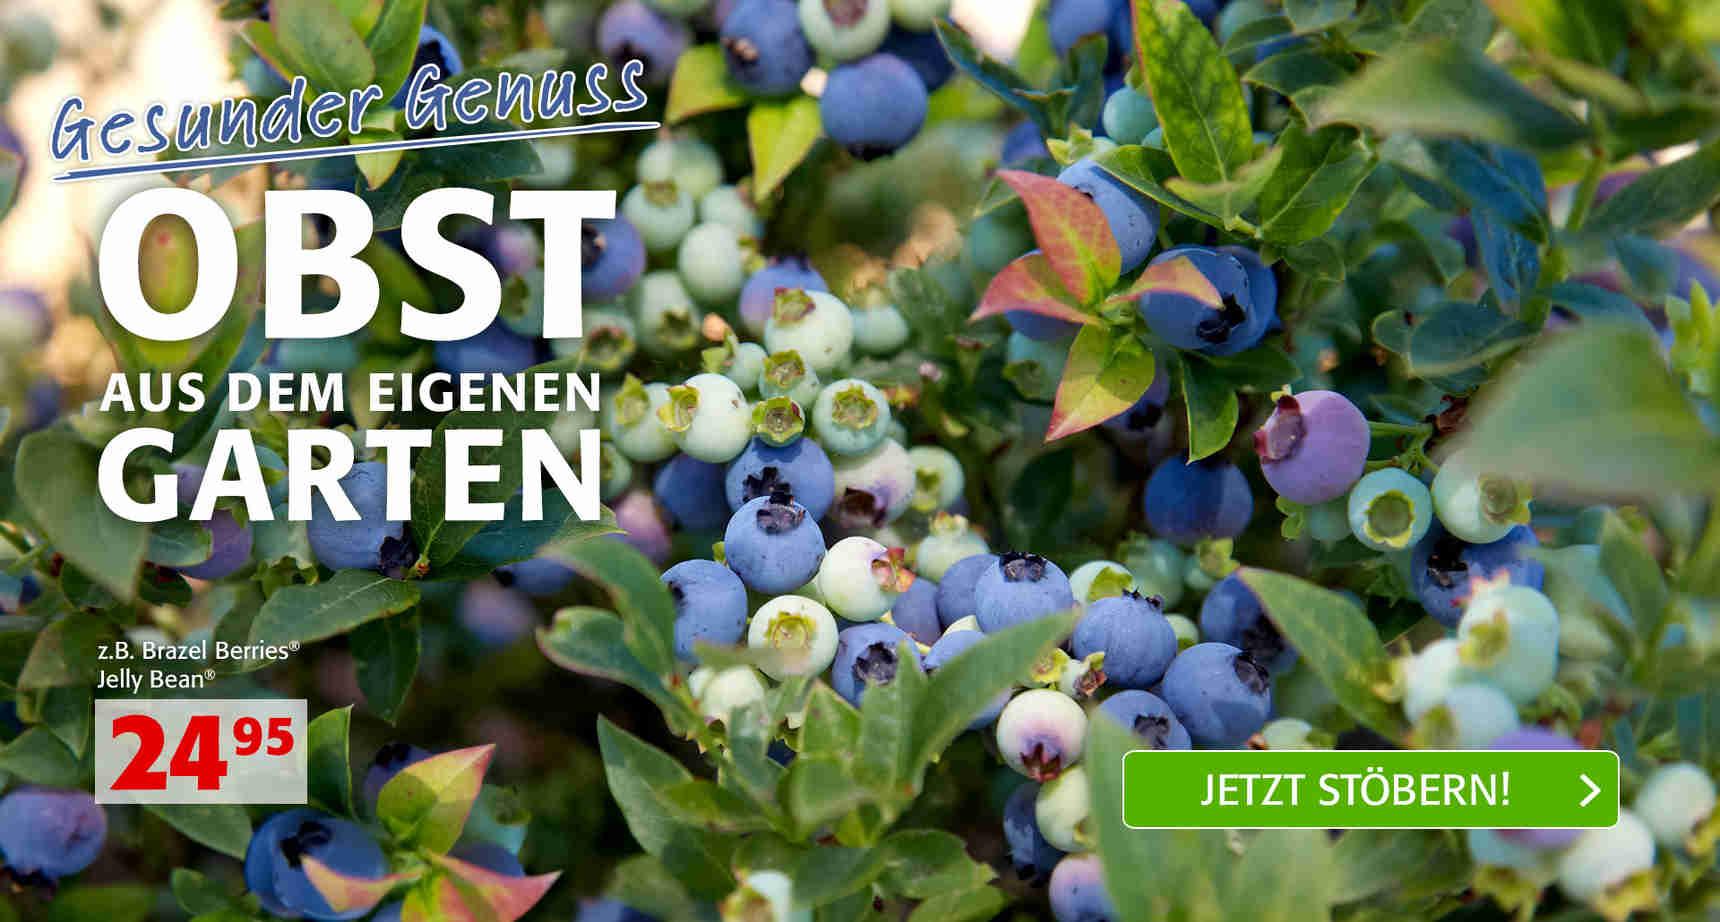 Poetschke Gartenversand Image Mag